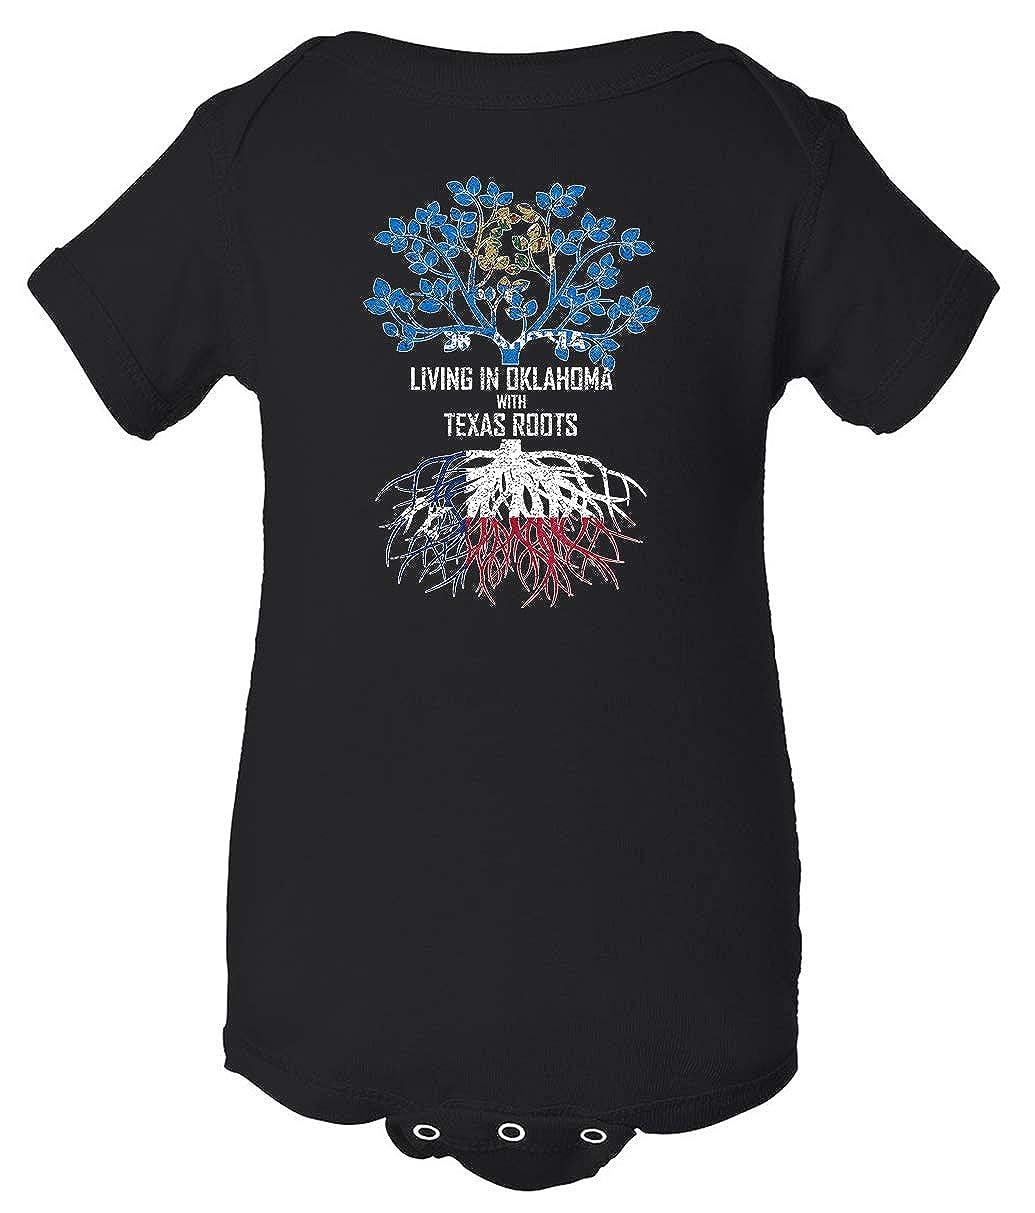 Tenacitee Babys Living in Oklahoma Texas Roots Shirt